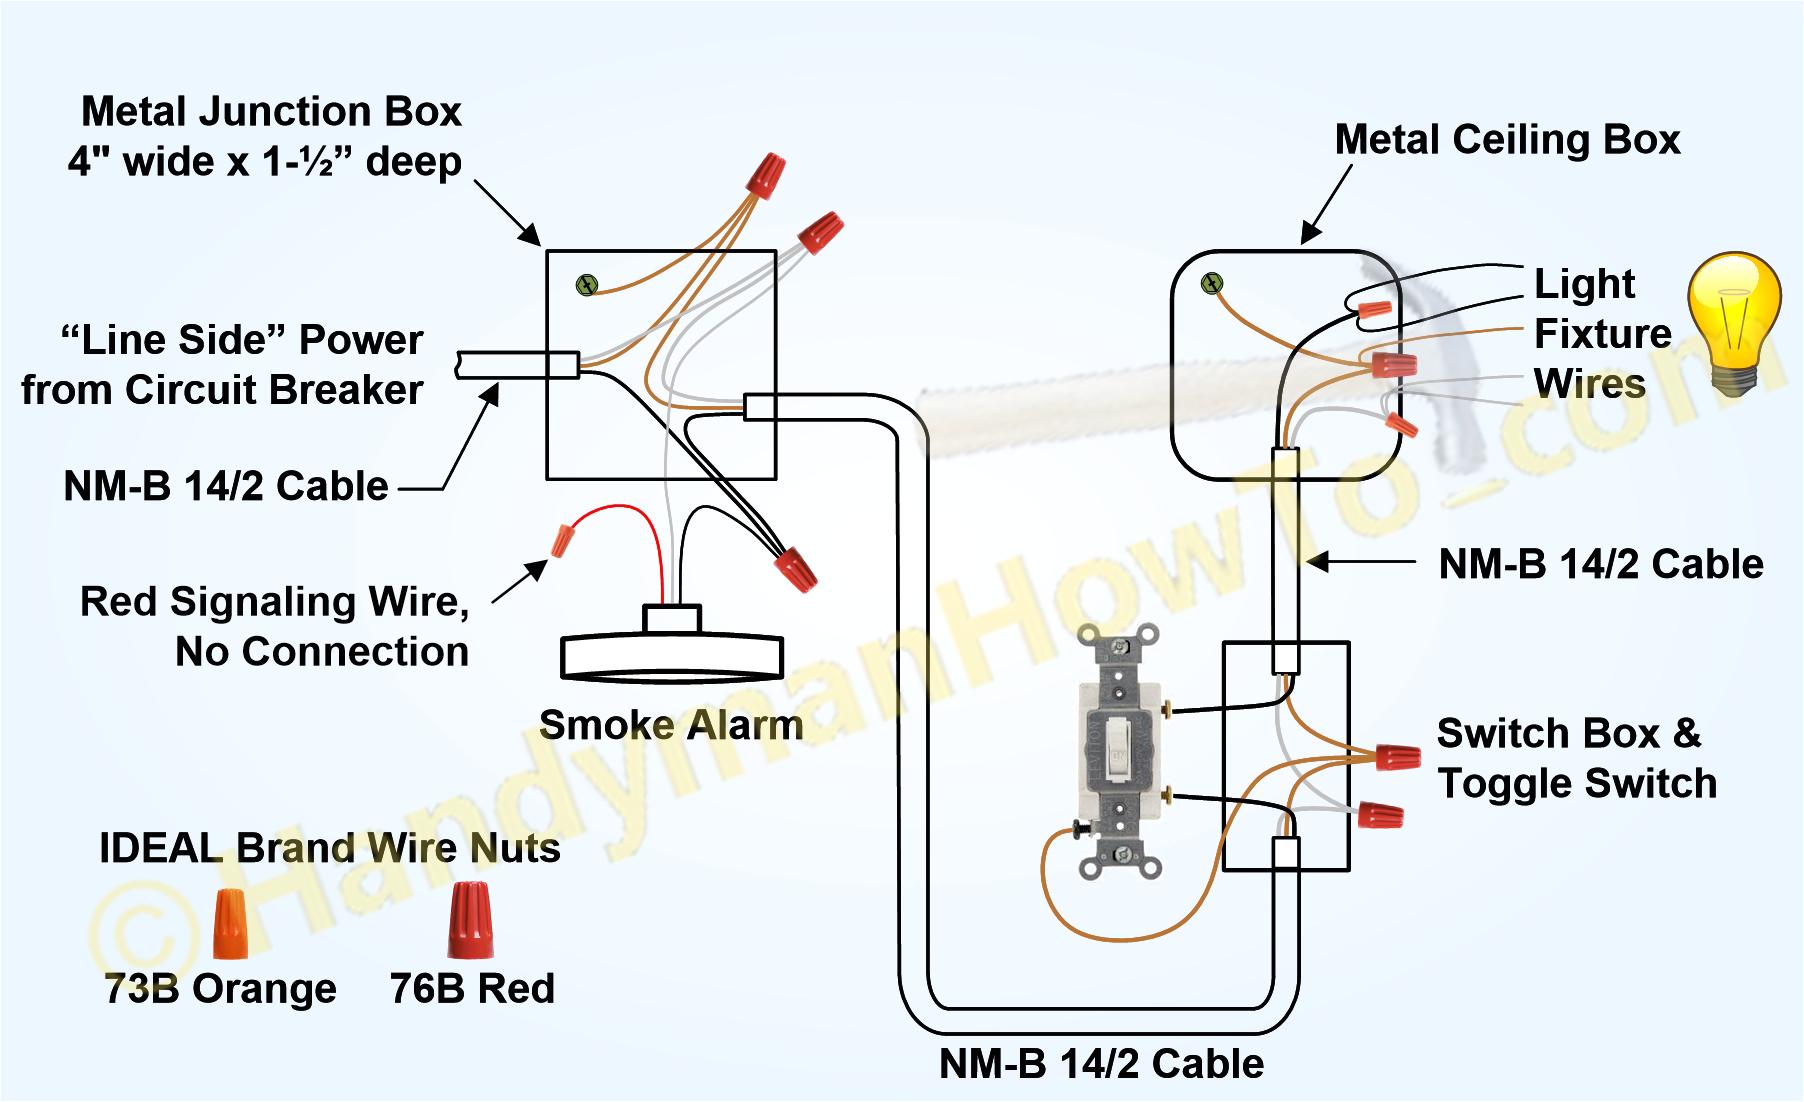 Smoke Detector 2151 Wiring Diagram 68 Buick Fuse Diagram Wiring Schematic Cusshman Tukune Jeanjaures37 Fr